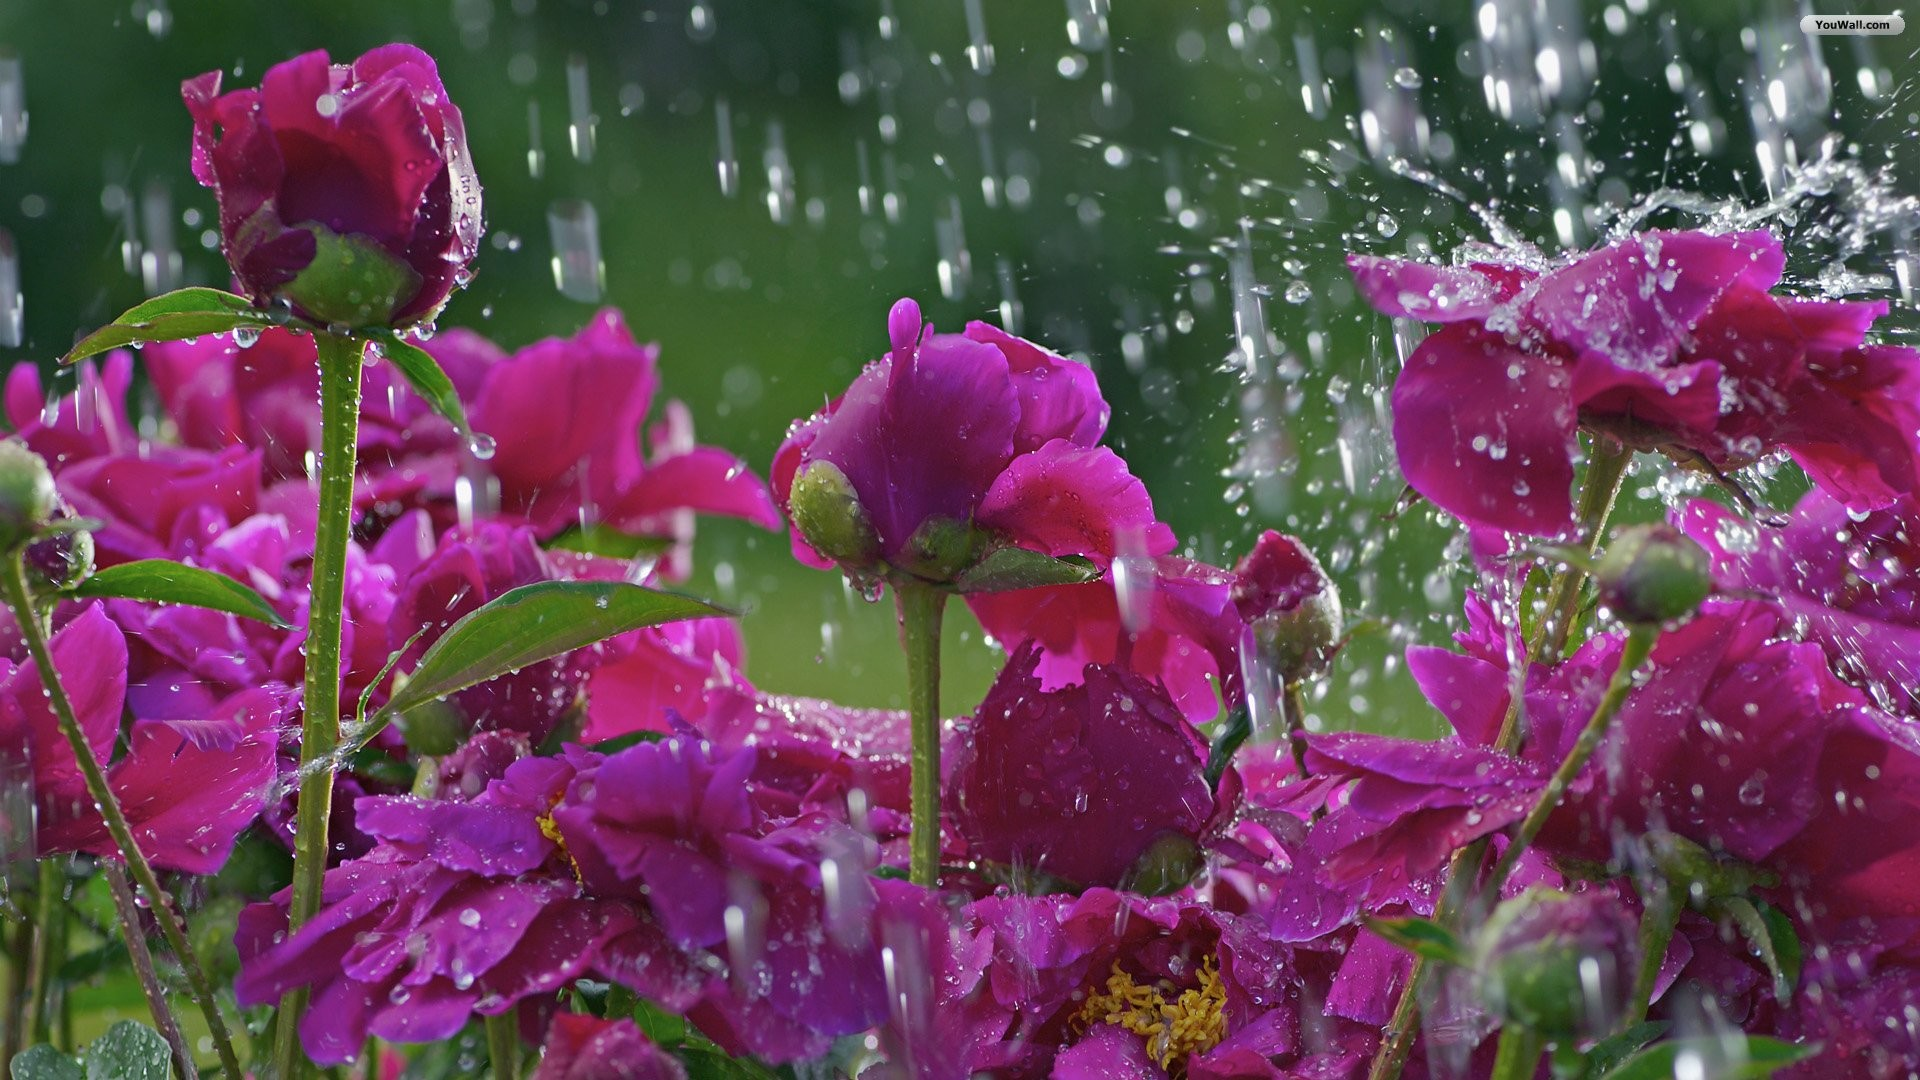 Spring desktop wallpapers backgrounds 65 images 1920x1329 free spring desktop wallpaper background photos monitor landscape 19201329 wallpaper hd mightylinksfo